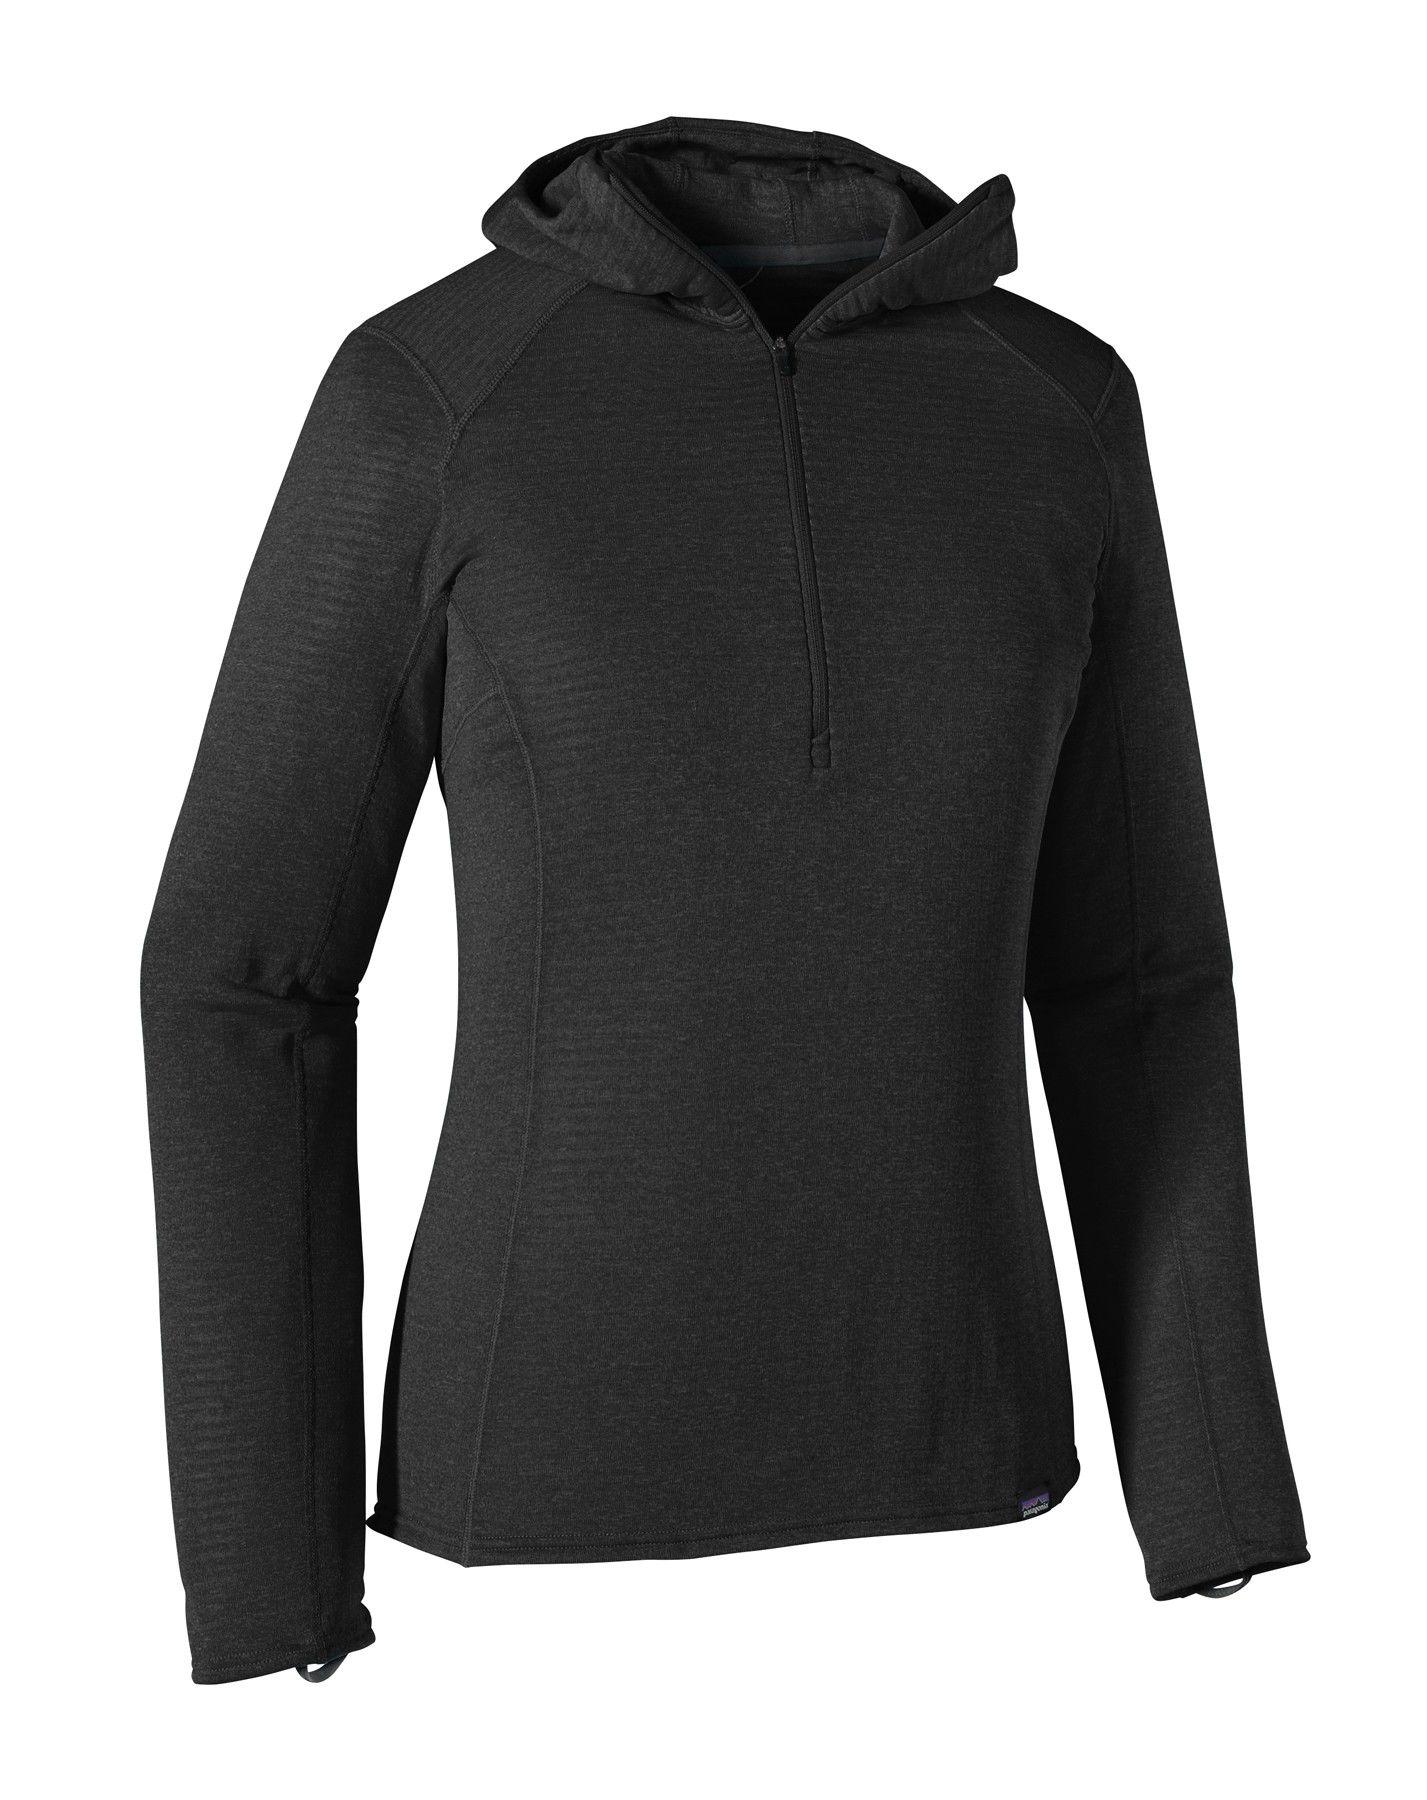 Patagonia Capilene Thermal Weight Zip Neck, Black Schwarz, M